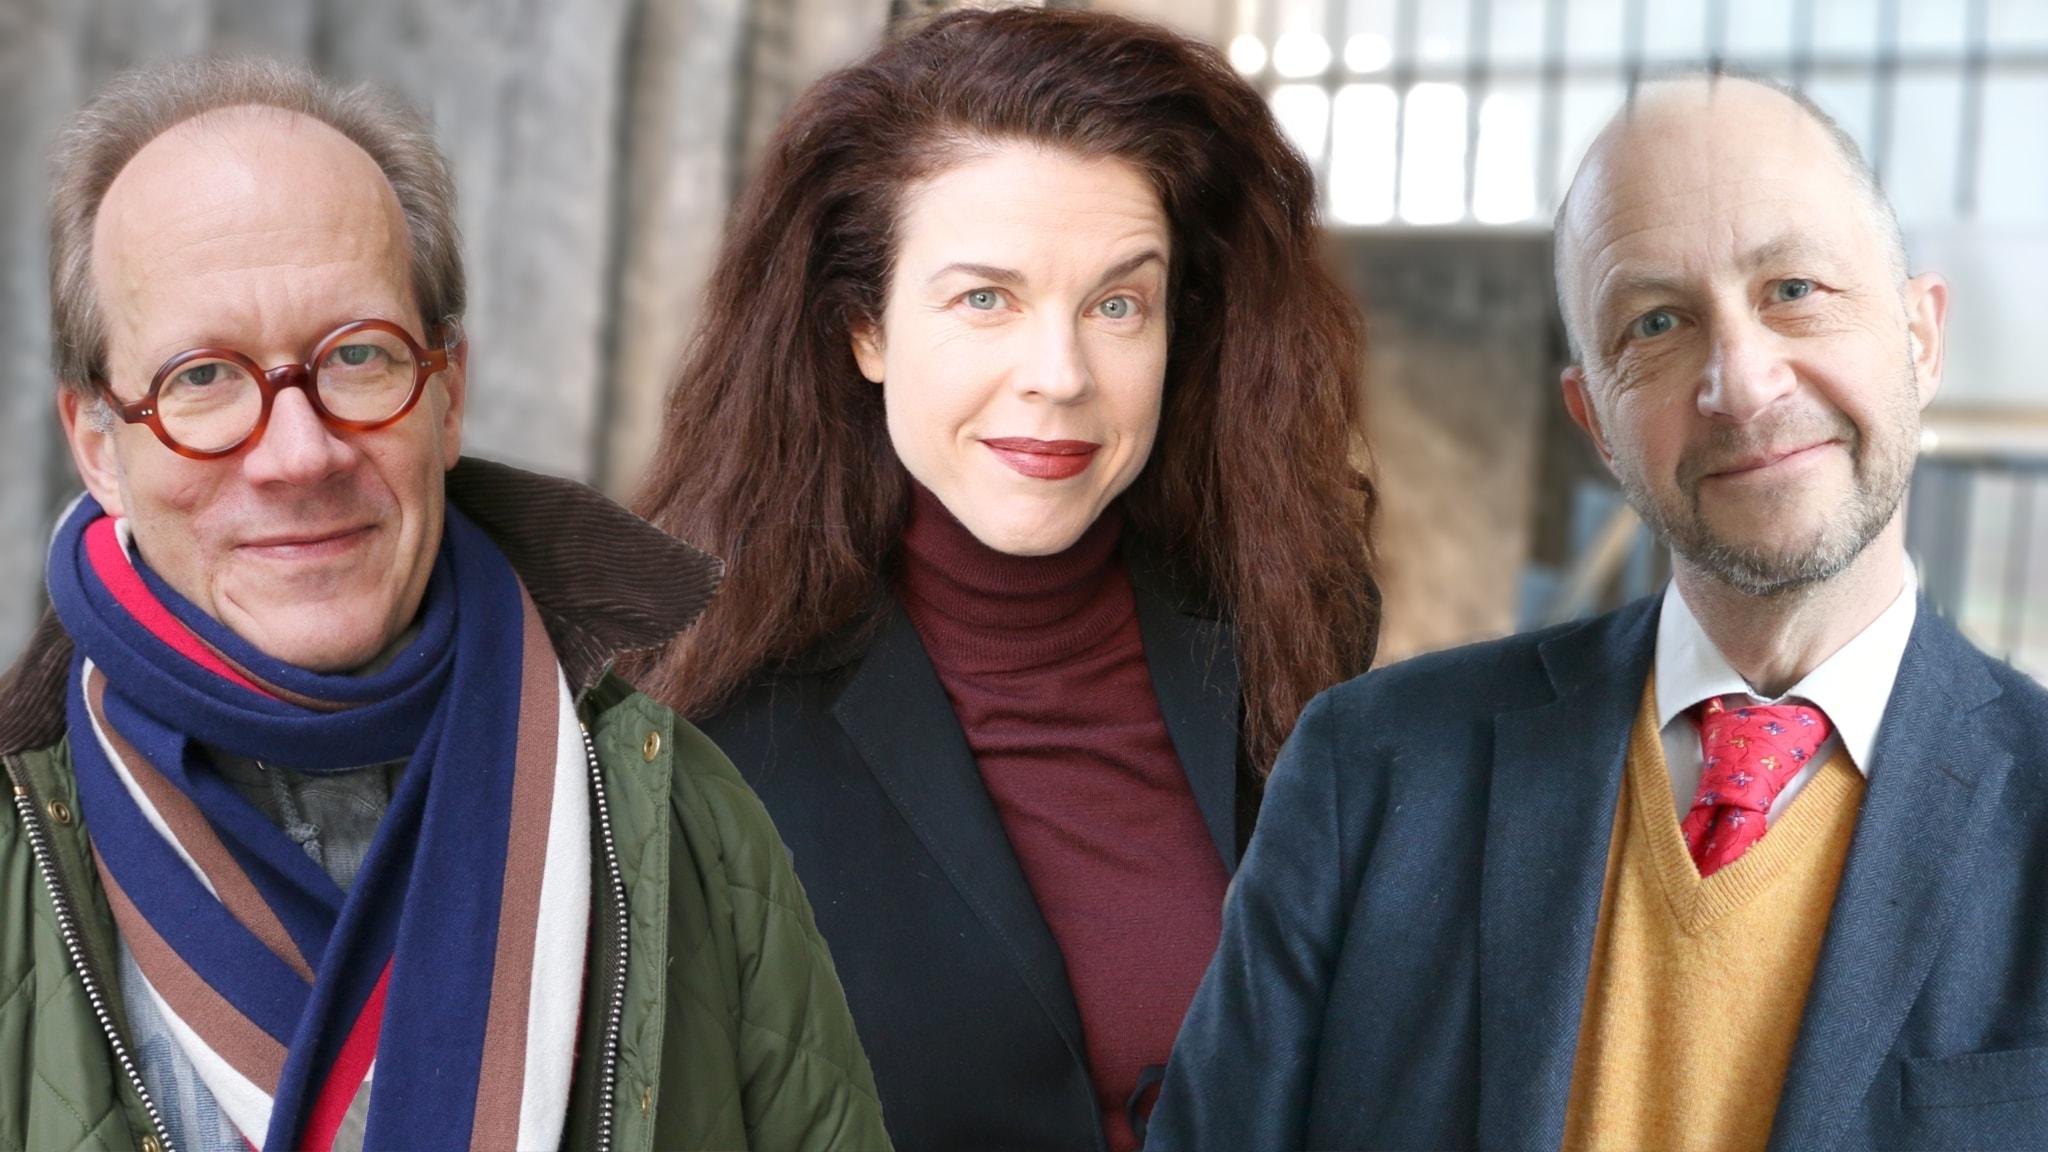 Johan Hakelius, Jessika Gedin och Per Naroskin